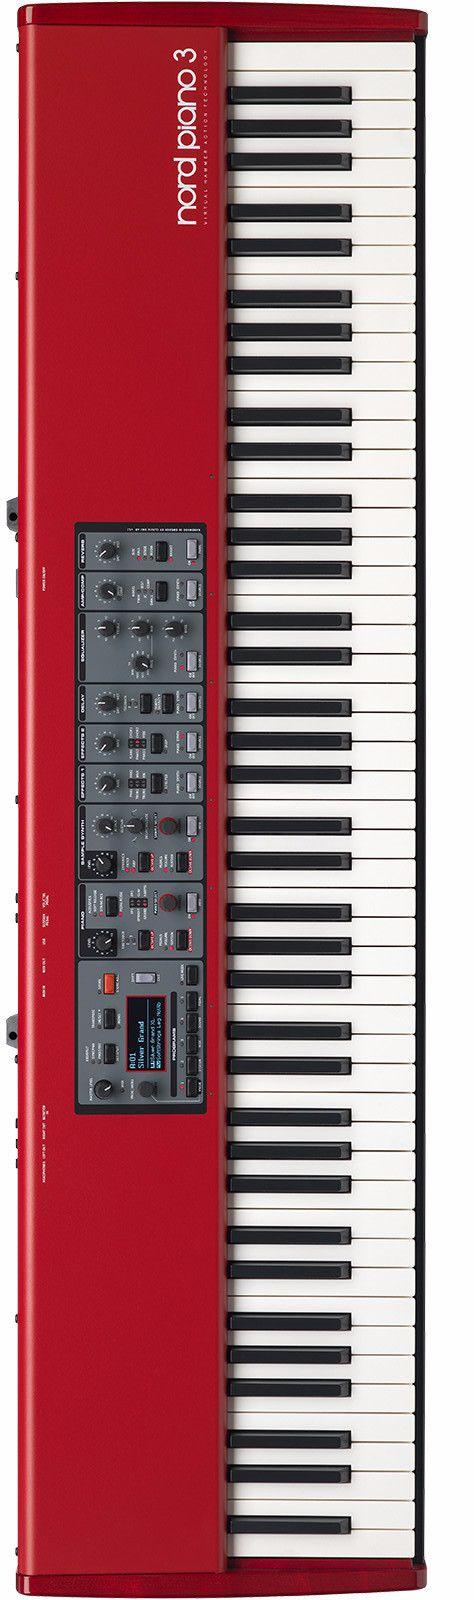 Nord Piano 3 88-Key Digital Performance Keyboard